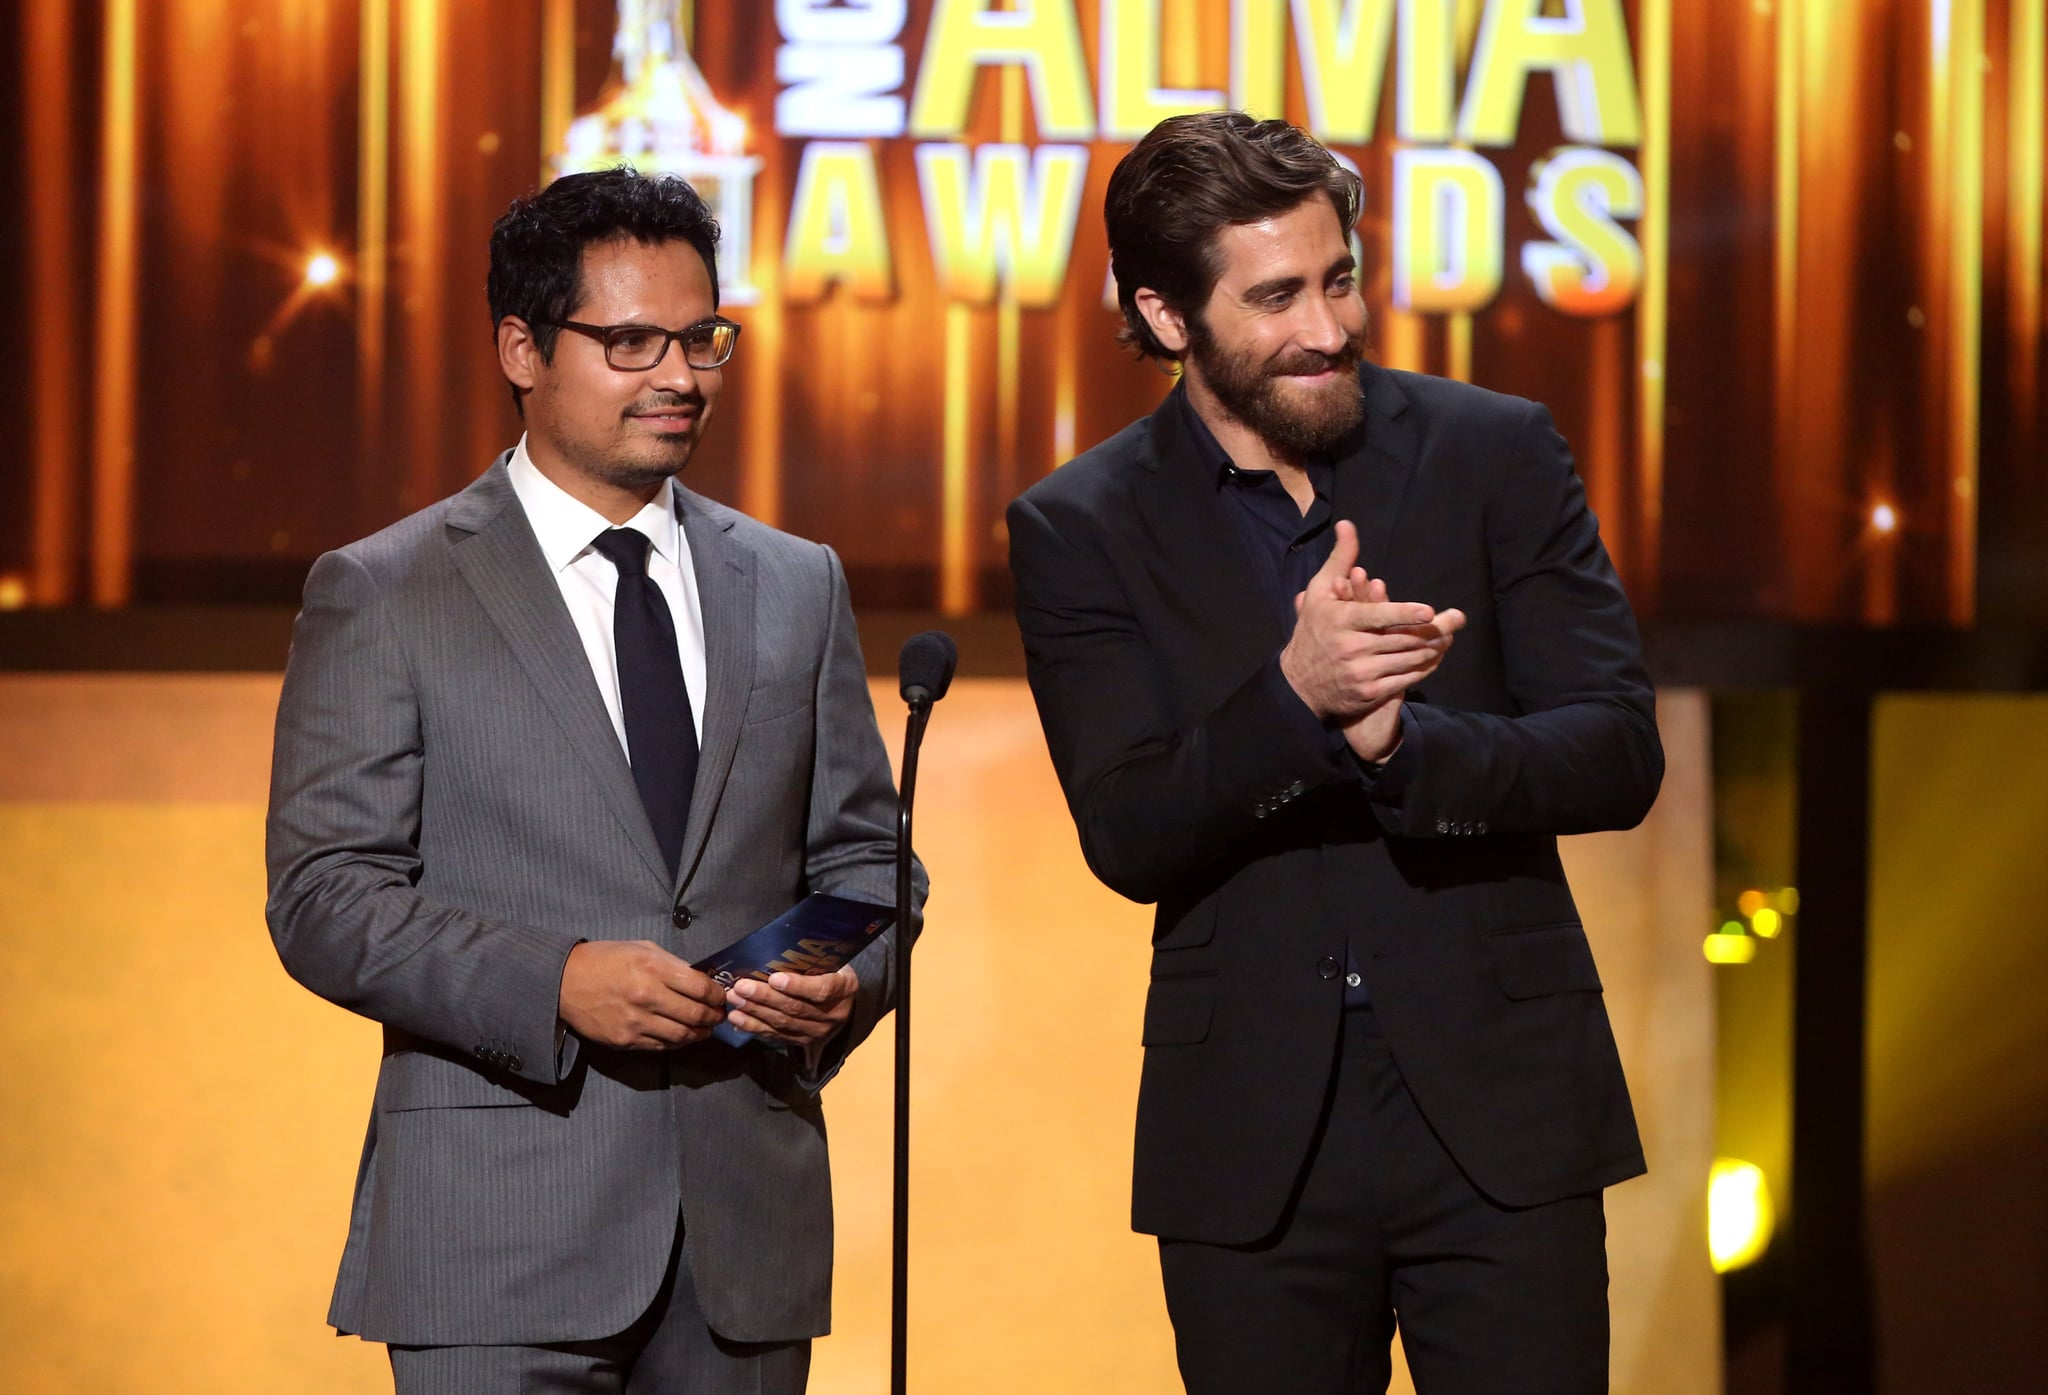 Jake Gyllenhaal presented an award with Michael Pena.